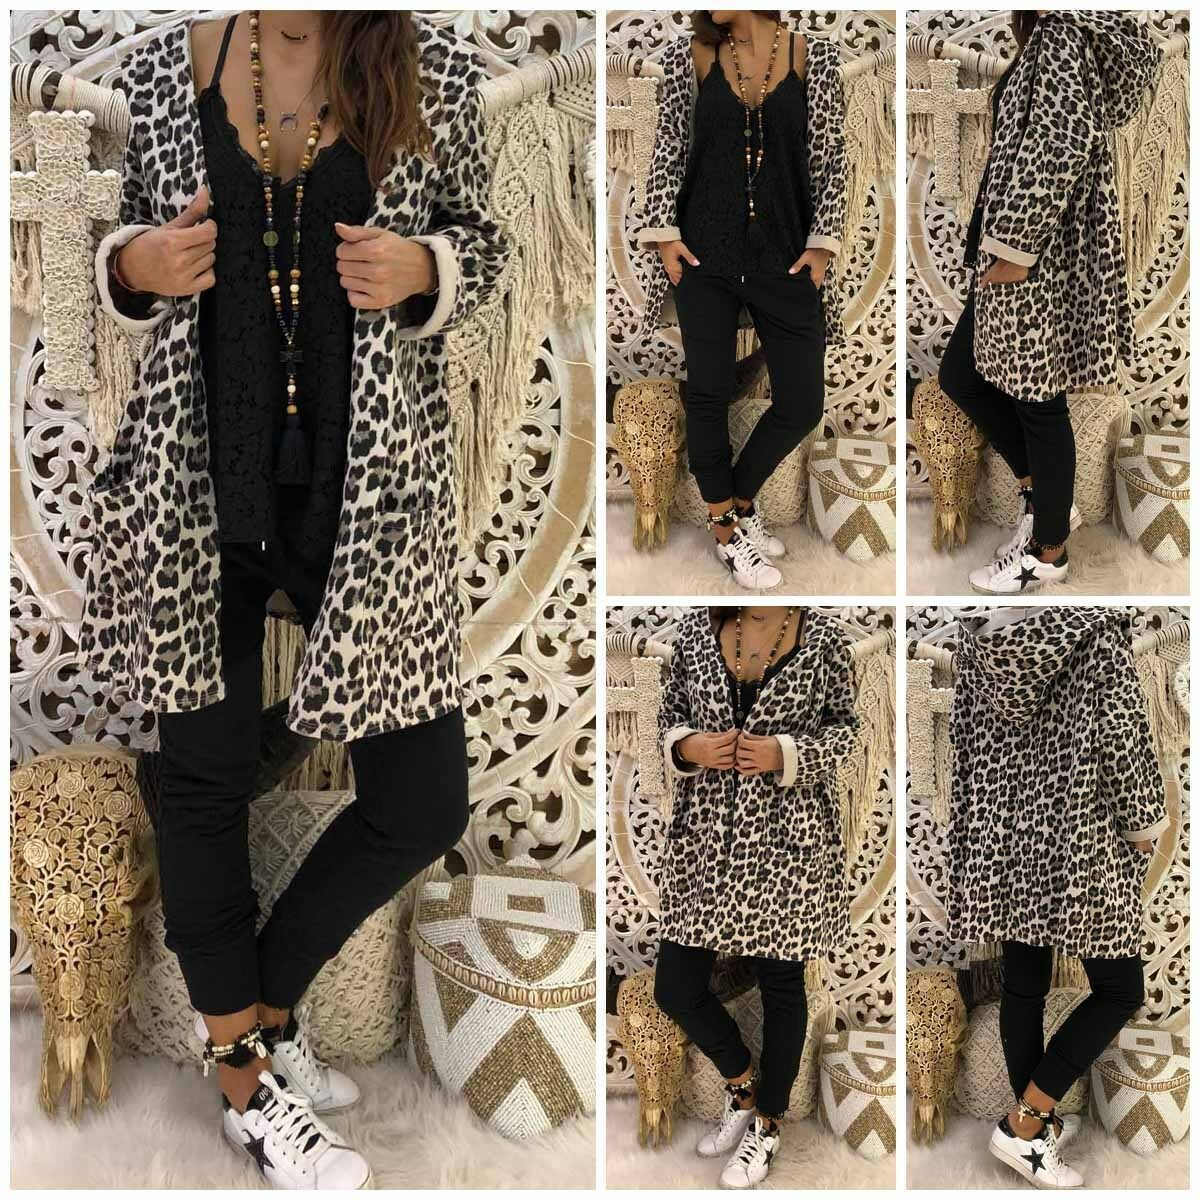 2020 Fashion Women's Leopard Printed Hooded Long Length Zipper Coat Cardigan Loose Casual Outwear